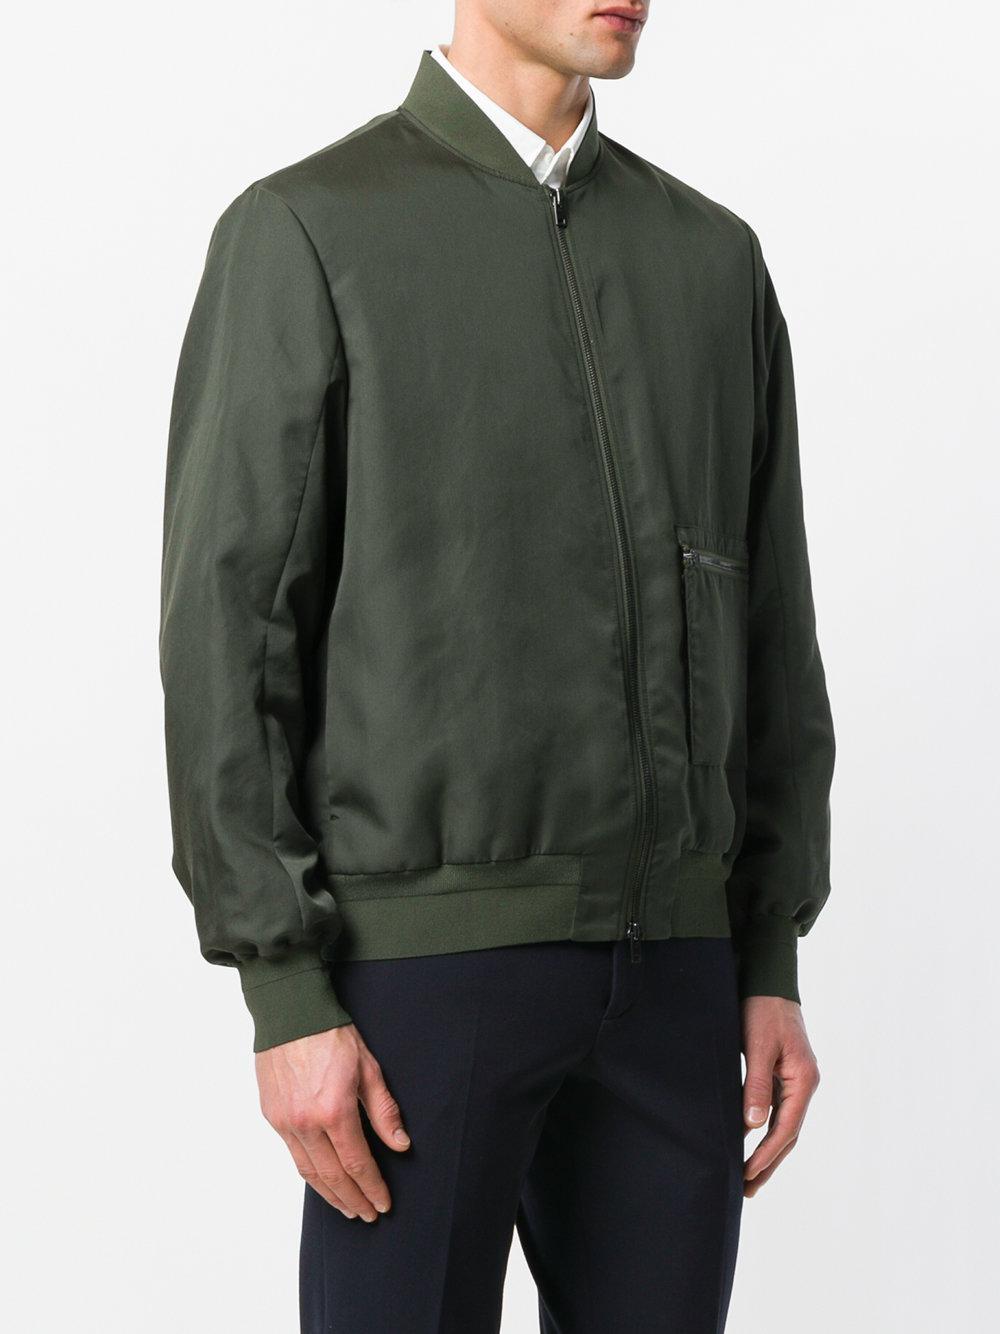 OAMC Synthetic Zipped Bomber Jacket in Green for Men